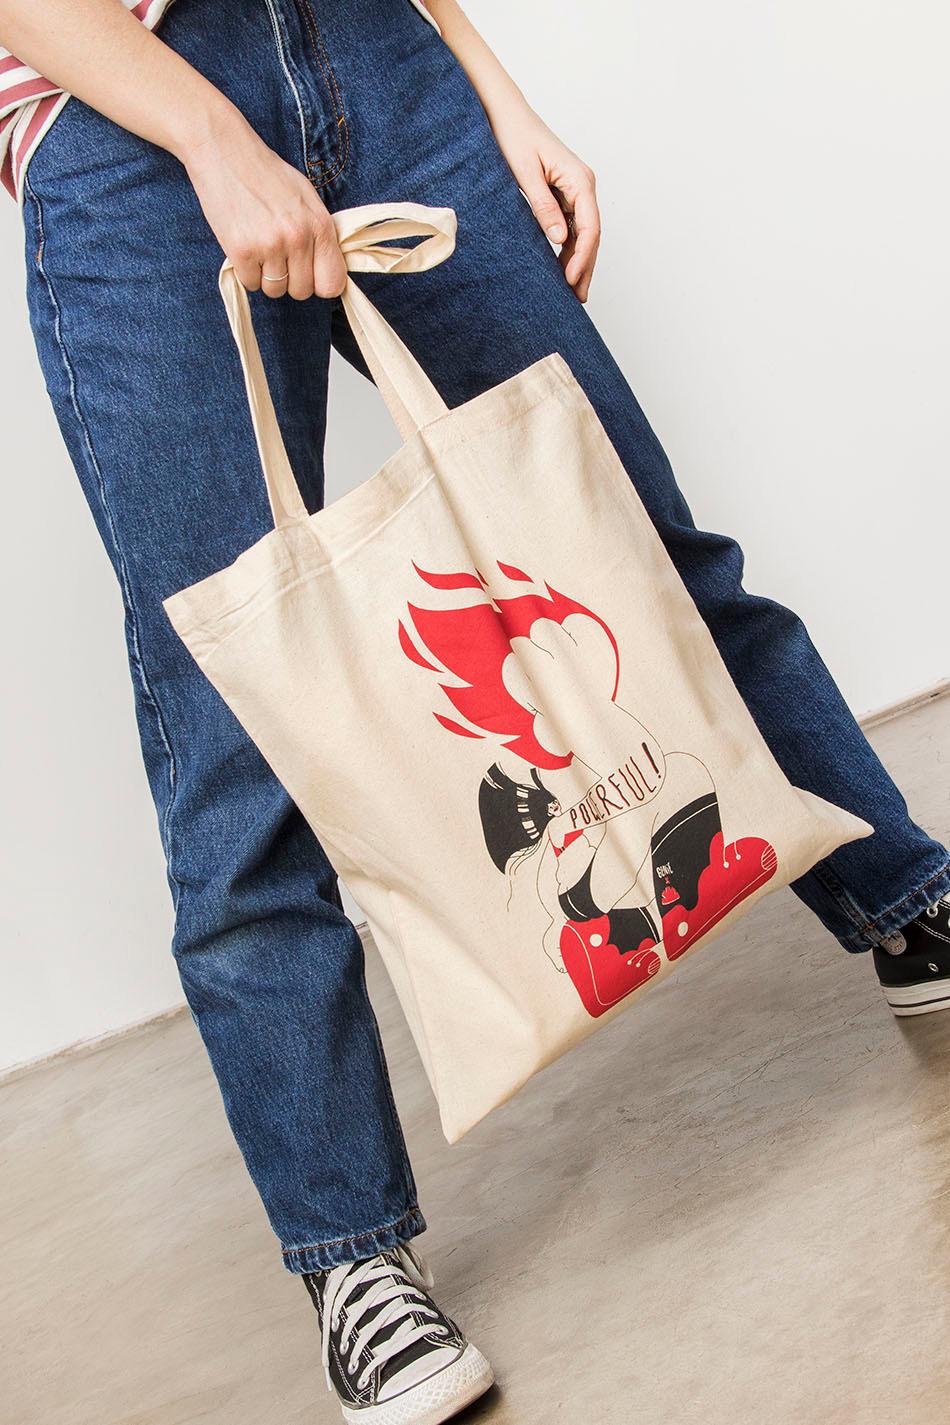 Tote Bag Powerful Women